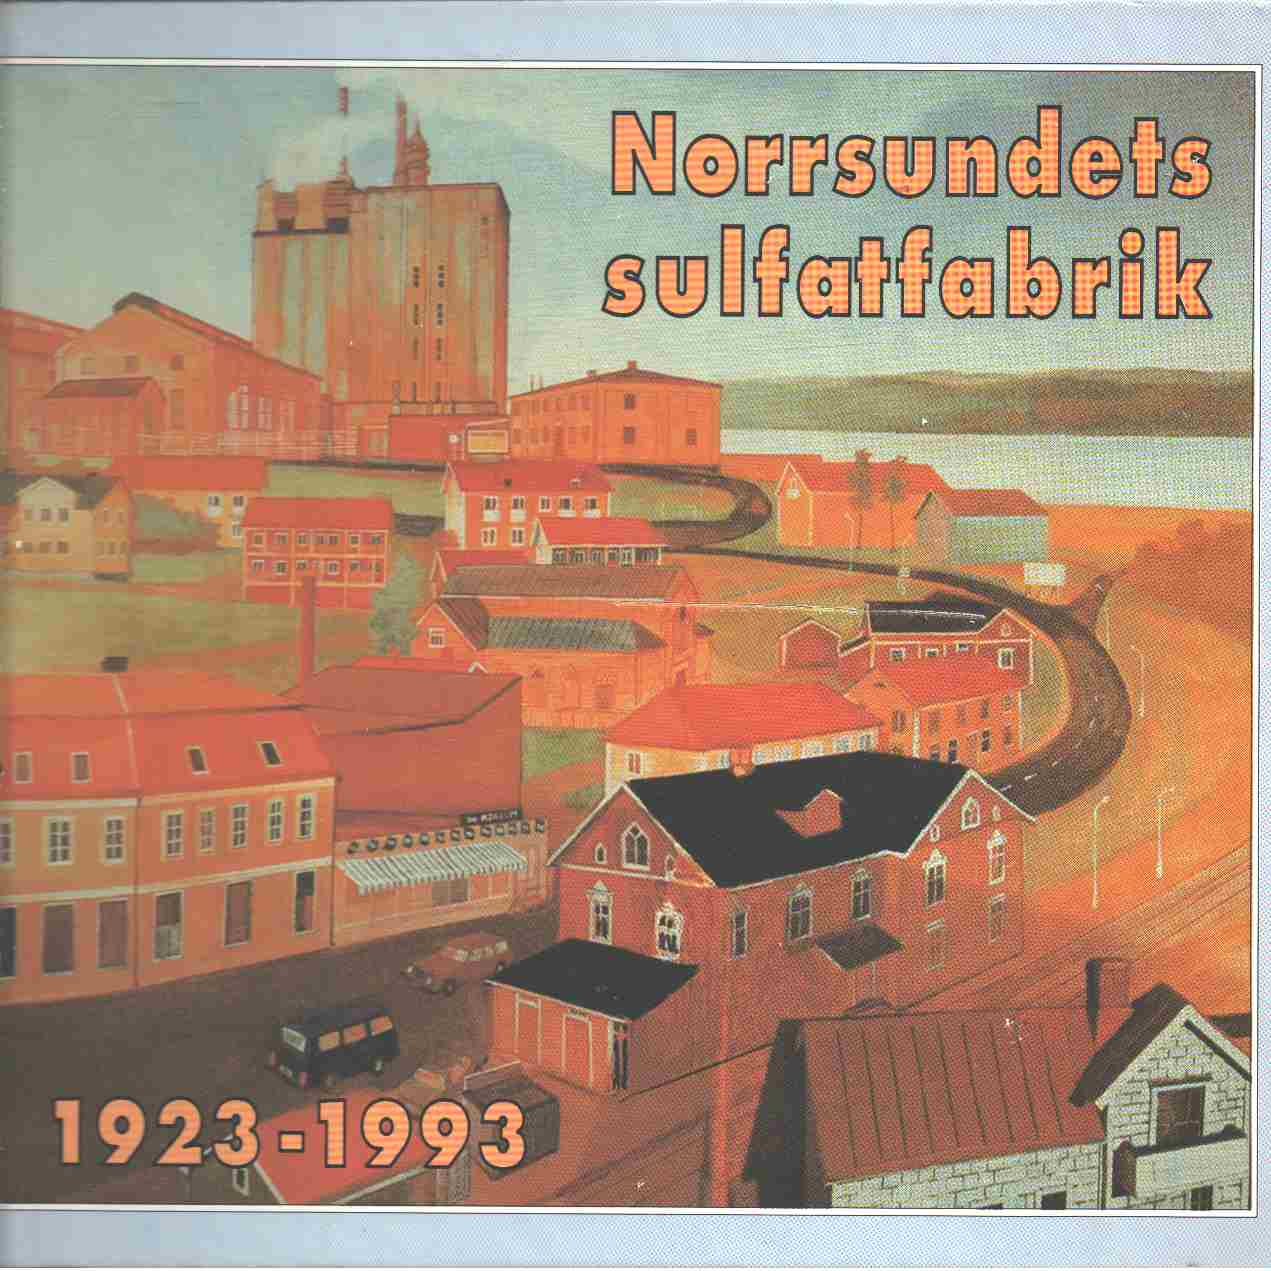 Norrsundets sulfatfabrik 1923-1993 - Lindgren, Lars och Berglund, Anders